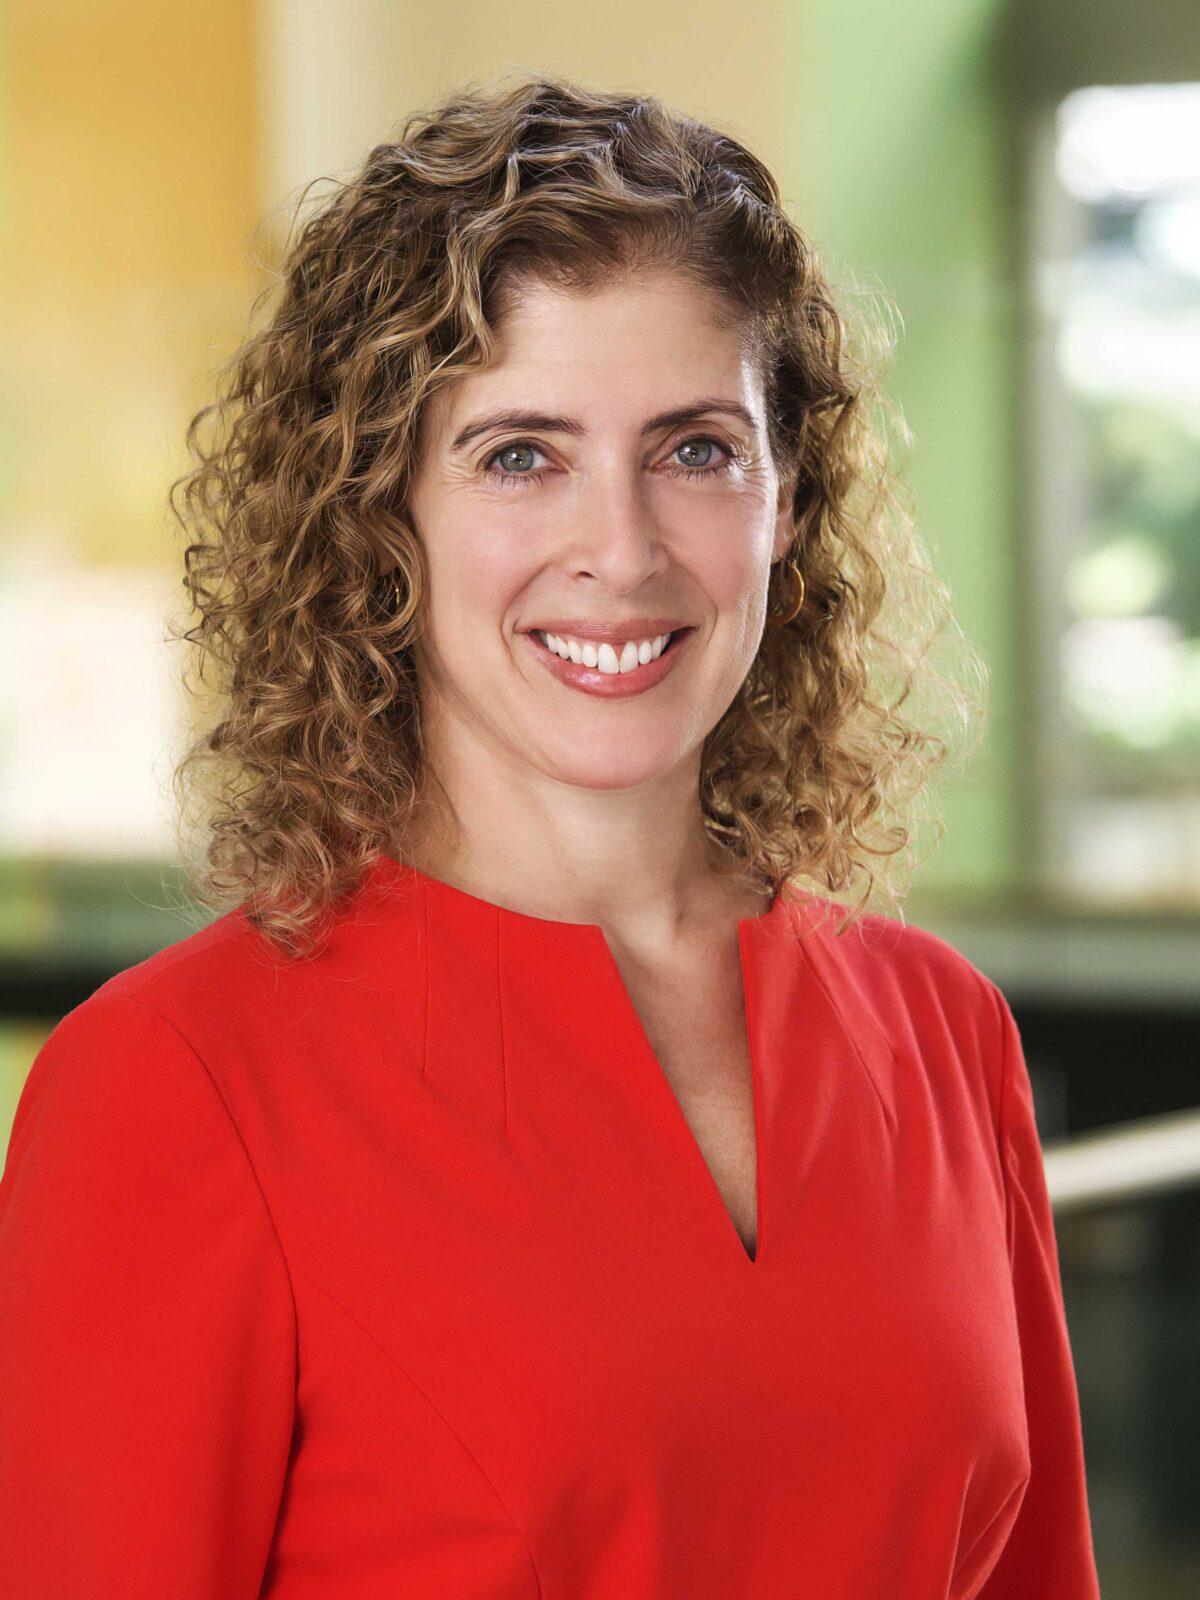 Maria Garlock